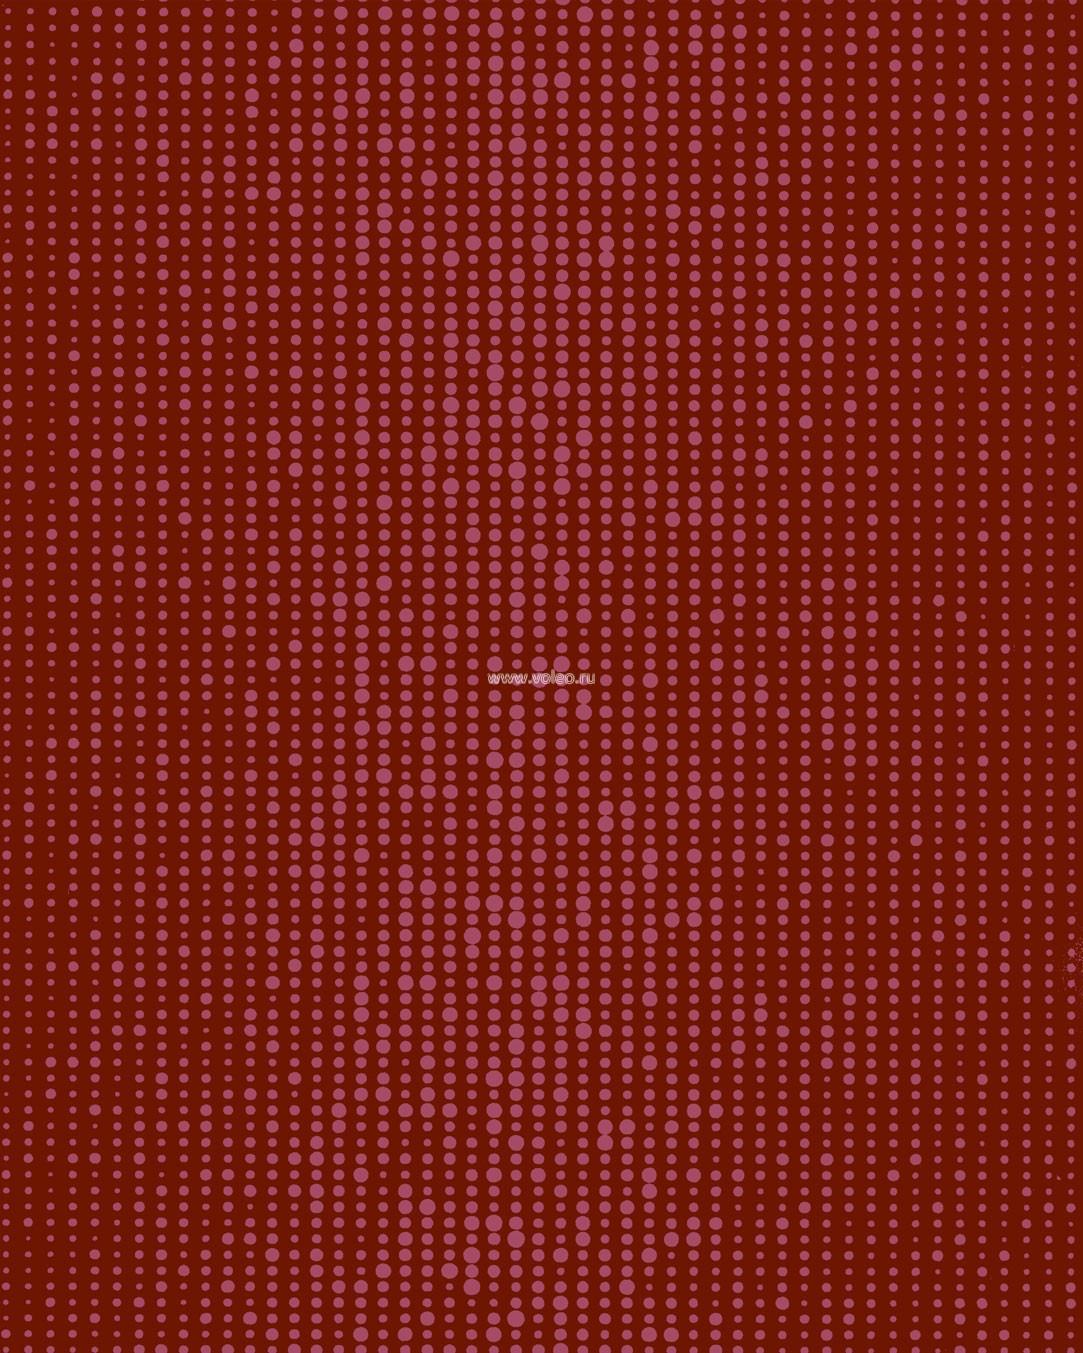 Обои Cole & Son Geometric 93/8029, интернет магазин Волео